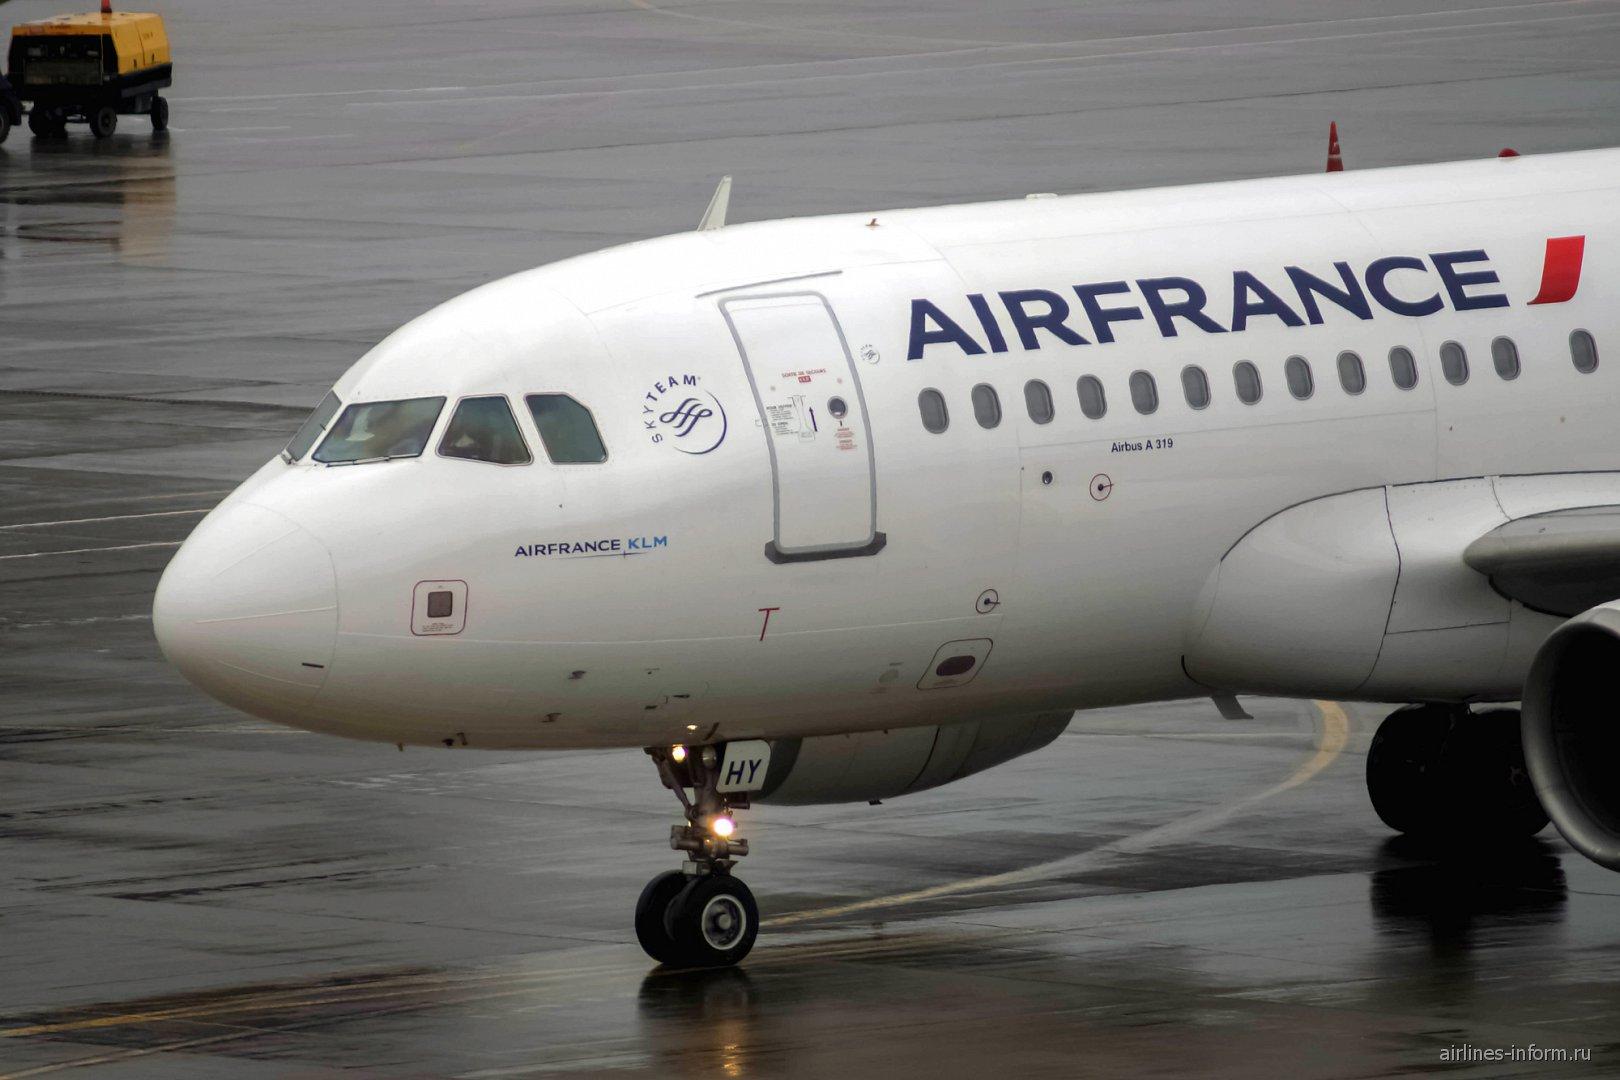 Airbus A319 авиакомпании Air France в аэропорту Шереметьево